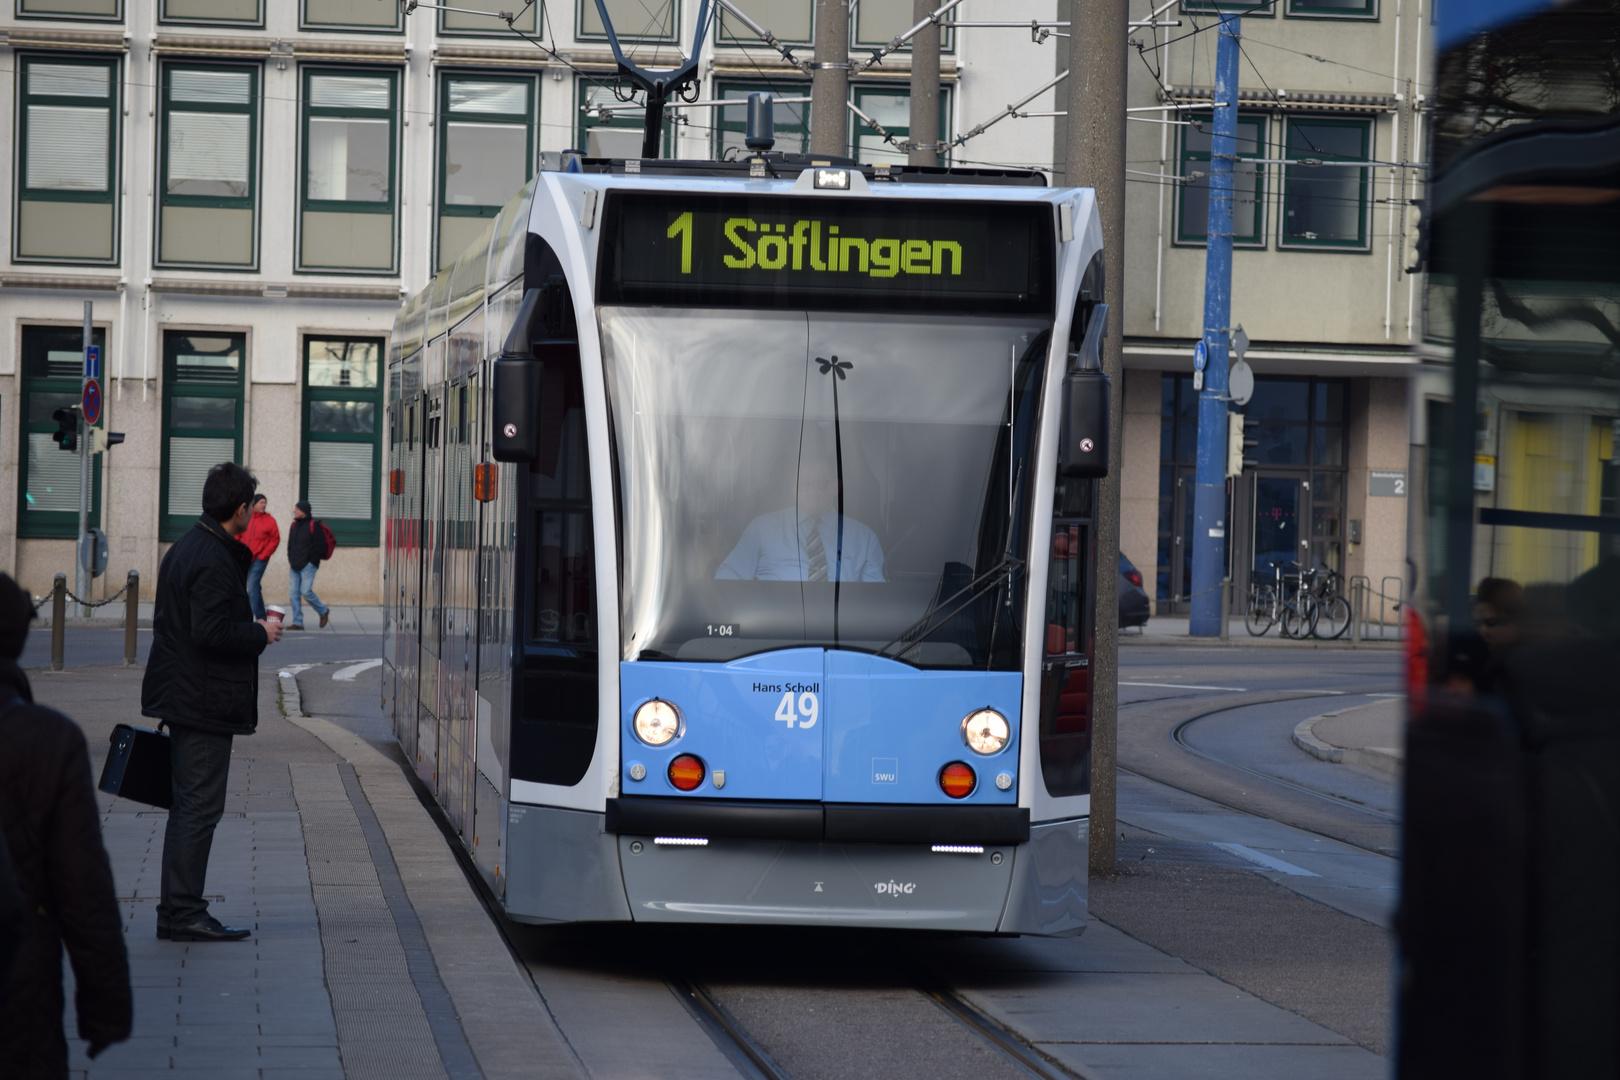 Ulmer Straßenbahn Wagen 49 Hans Scholl 01 Foto Bild Bus